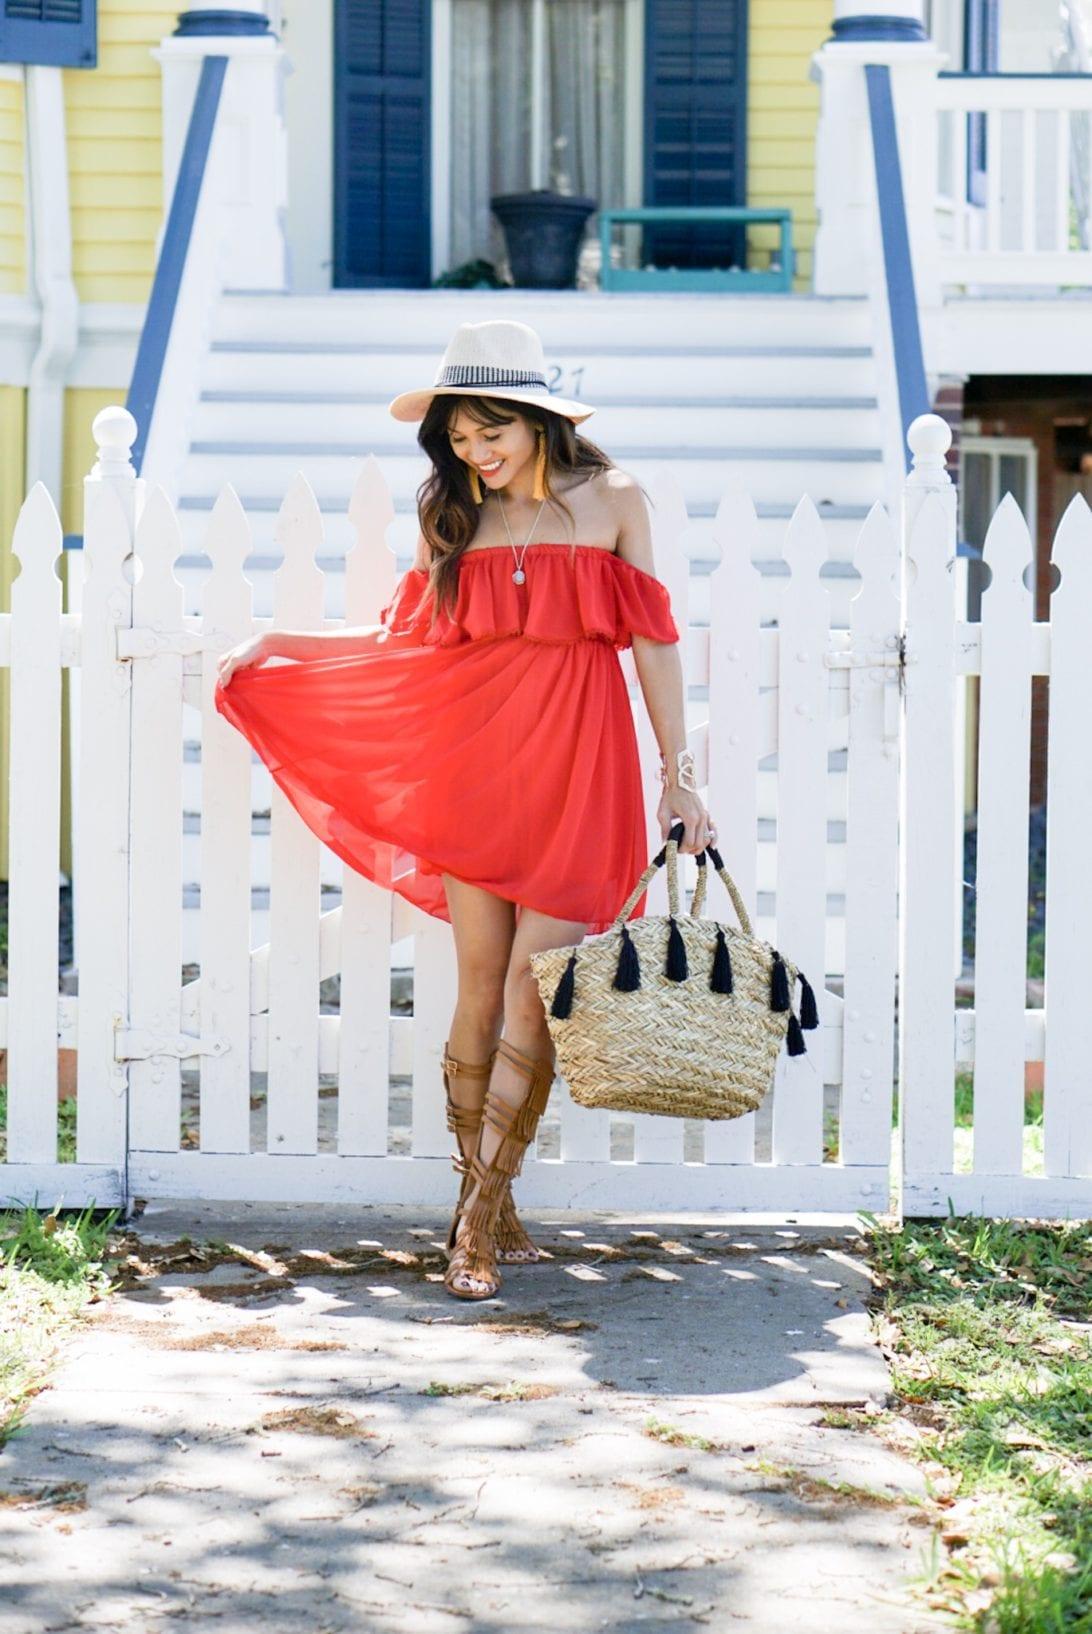 red dress, tire swing, galveston, beach style, summer style. off the shoulder, gladiators, tassel purse, tassel earrings